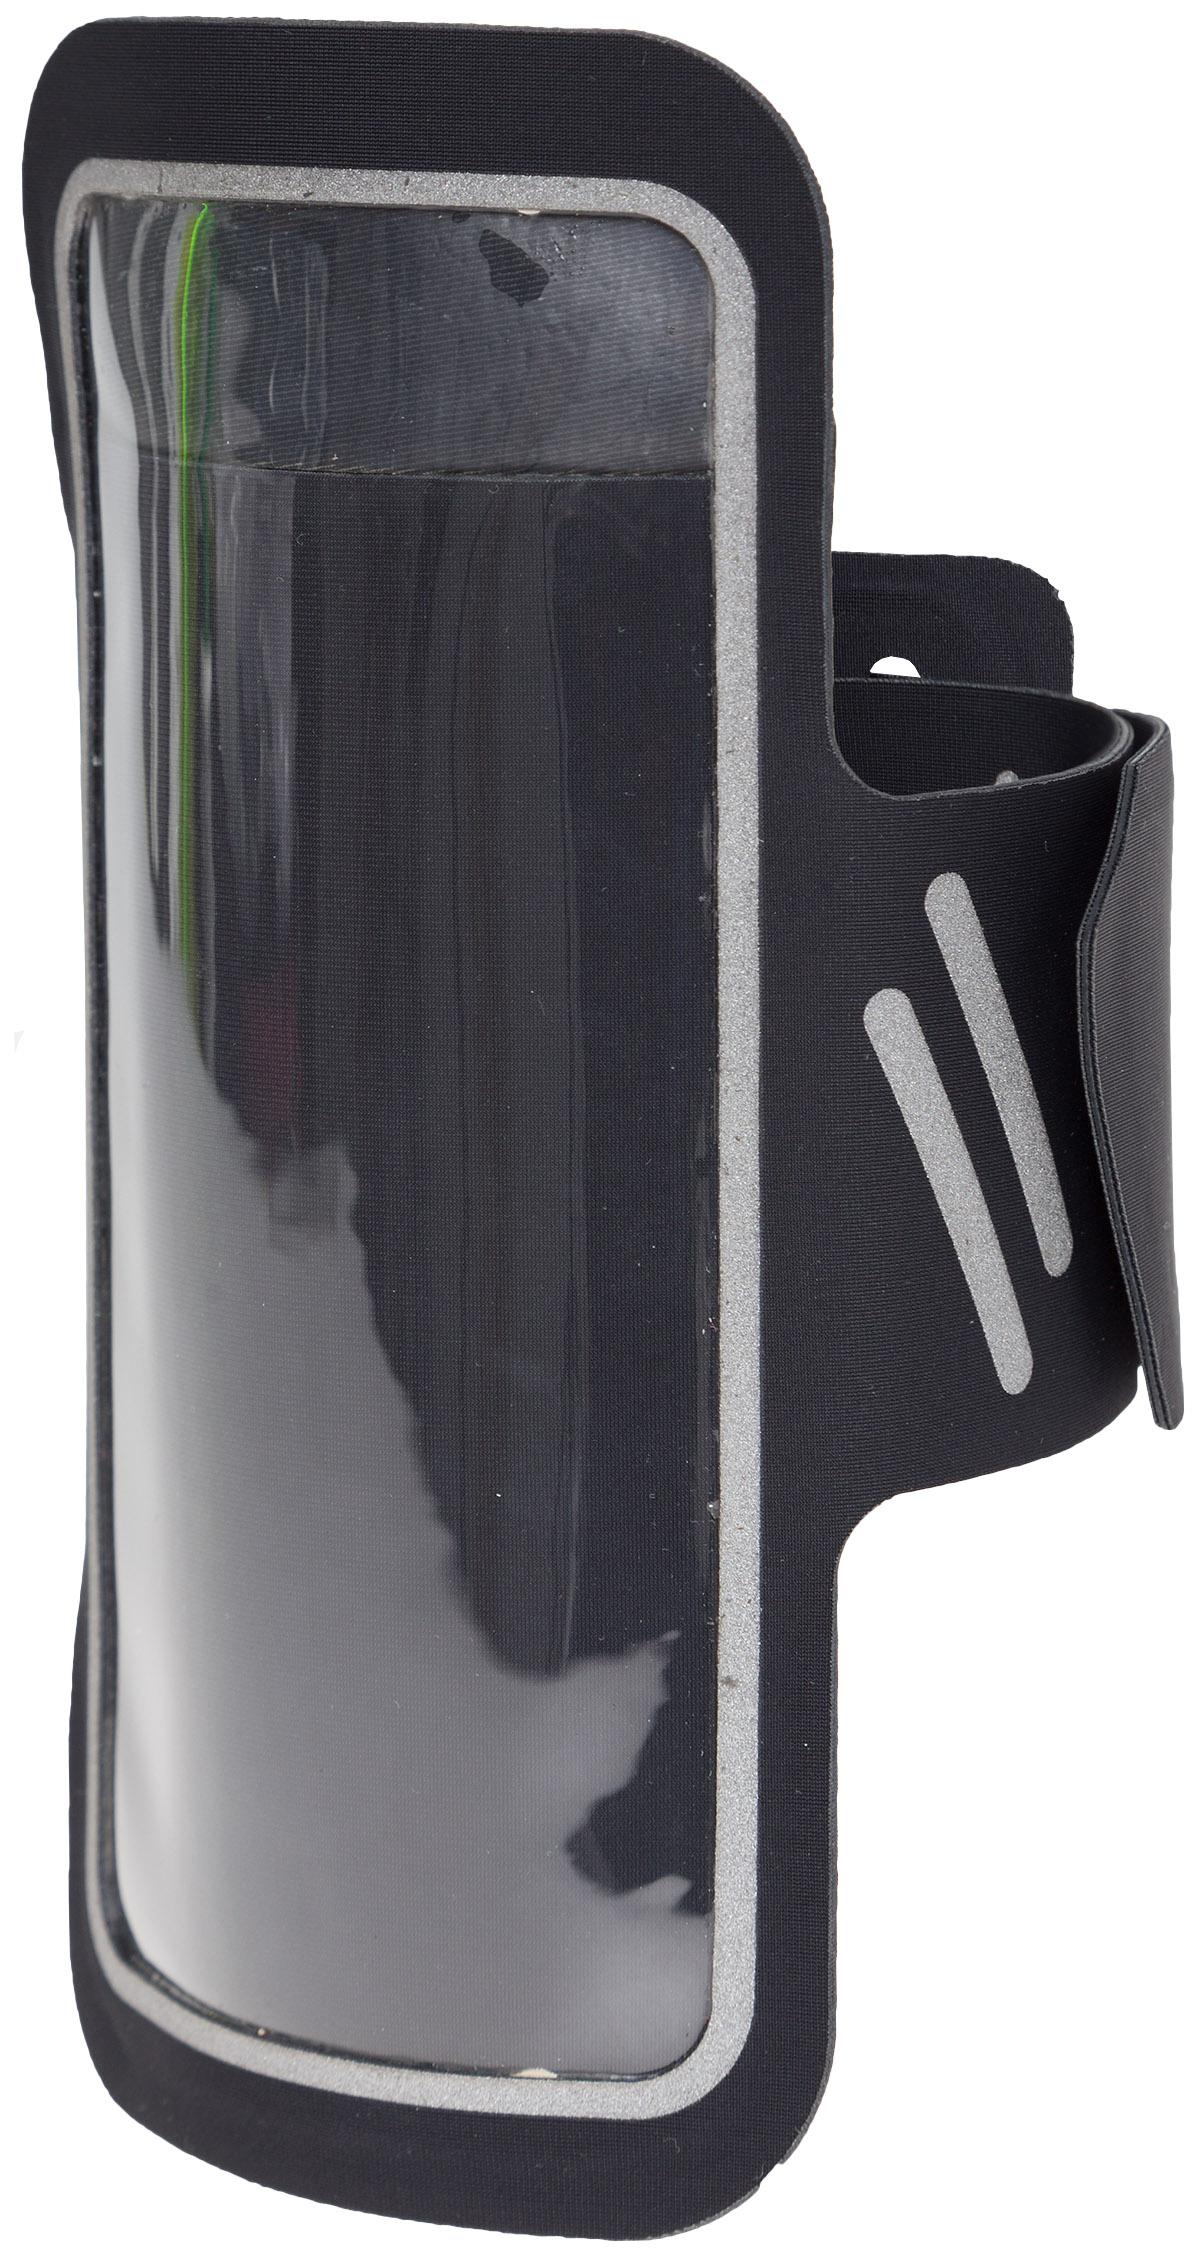 Púzdro na mobil 4F AKB002